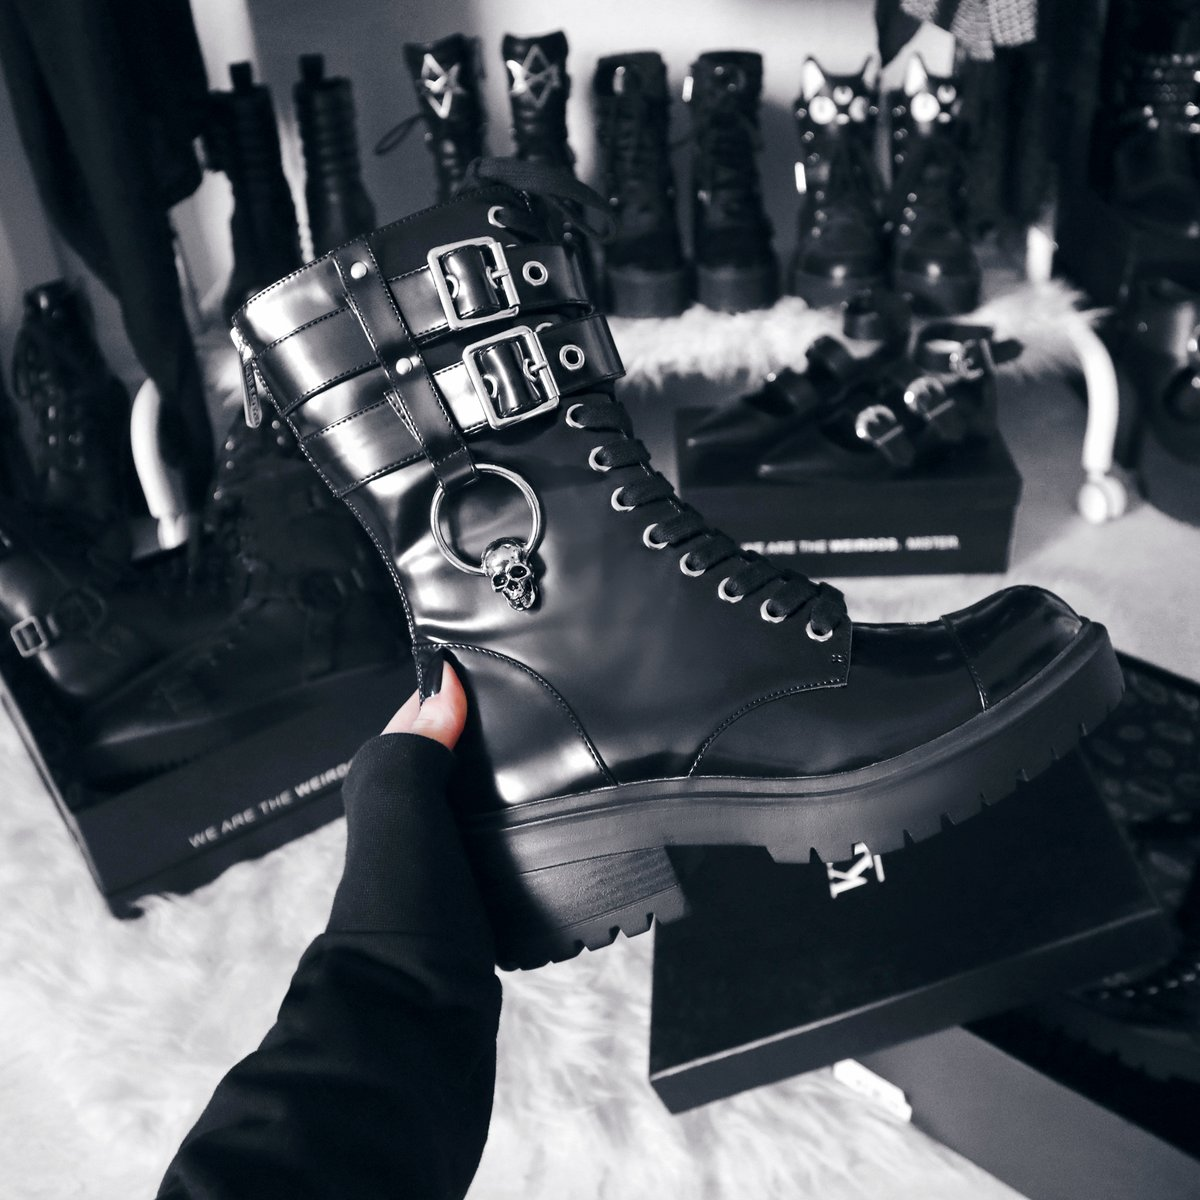 Get Yer Stomp On    Bones O-Ring Boots  http://killstar.co/BONES | We Ship Worldwide!#killstar #nugoth #gothicfashionpic.twitter.com/rXdVbMzUOb